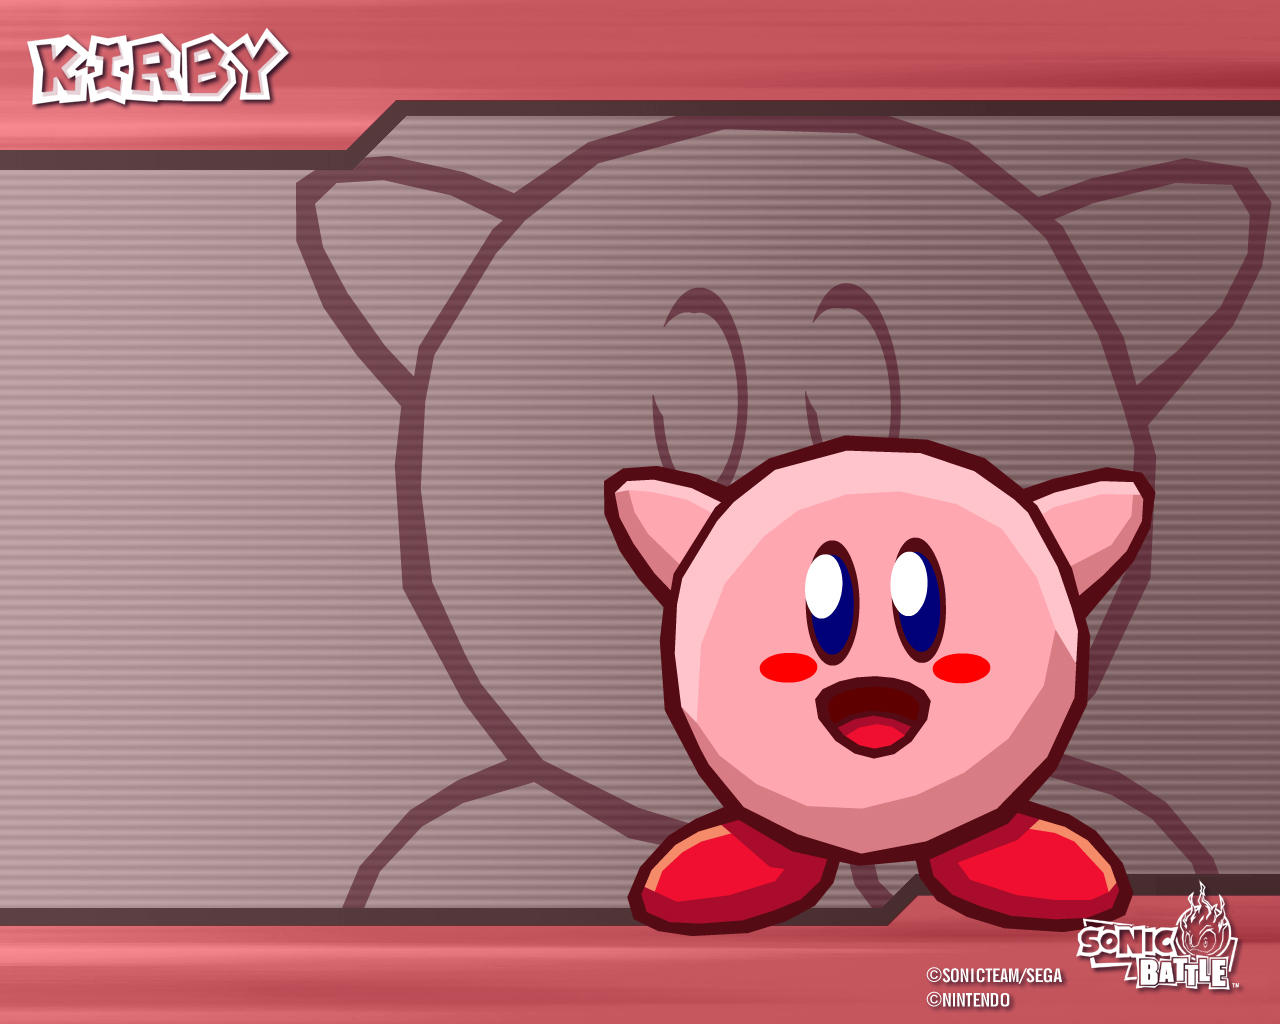 SB - Kirby by aha-mccoy